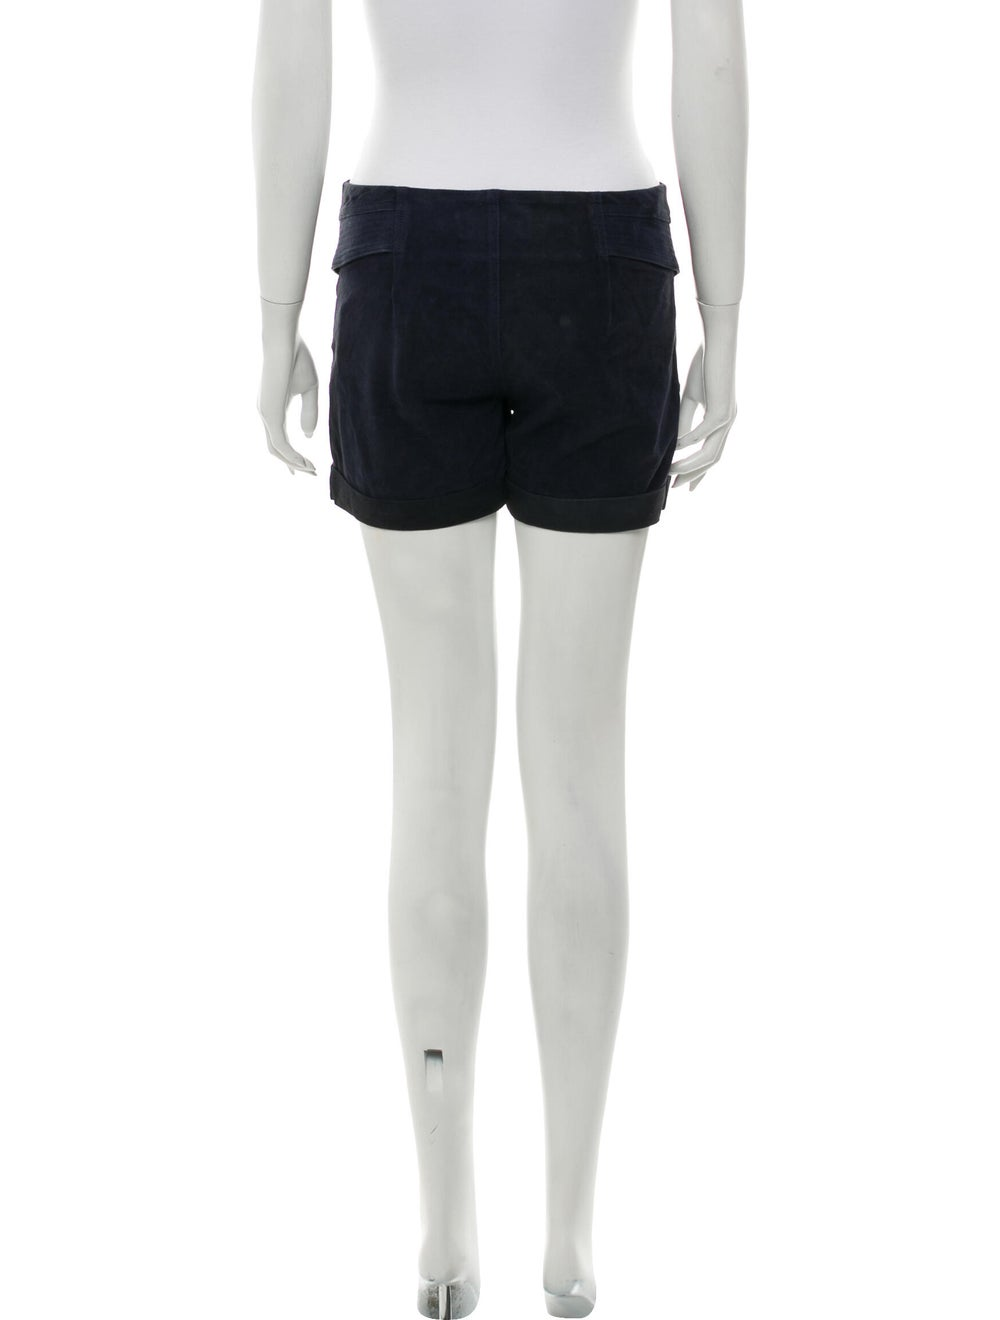 A.l.c. Goat Leather Mini Shorts Blue - image 3